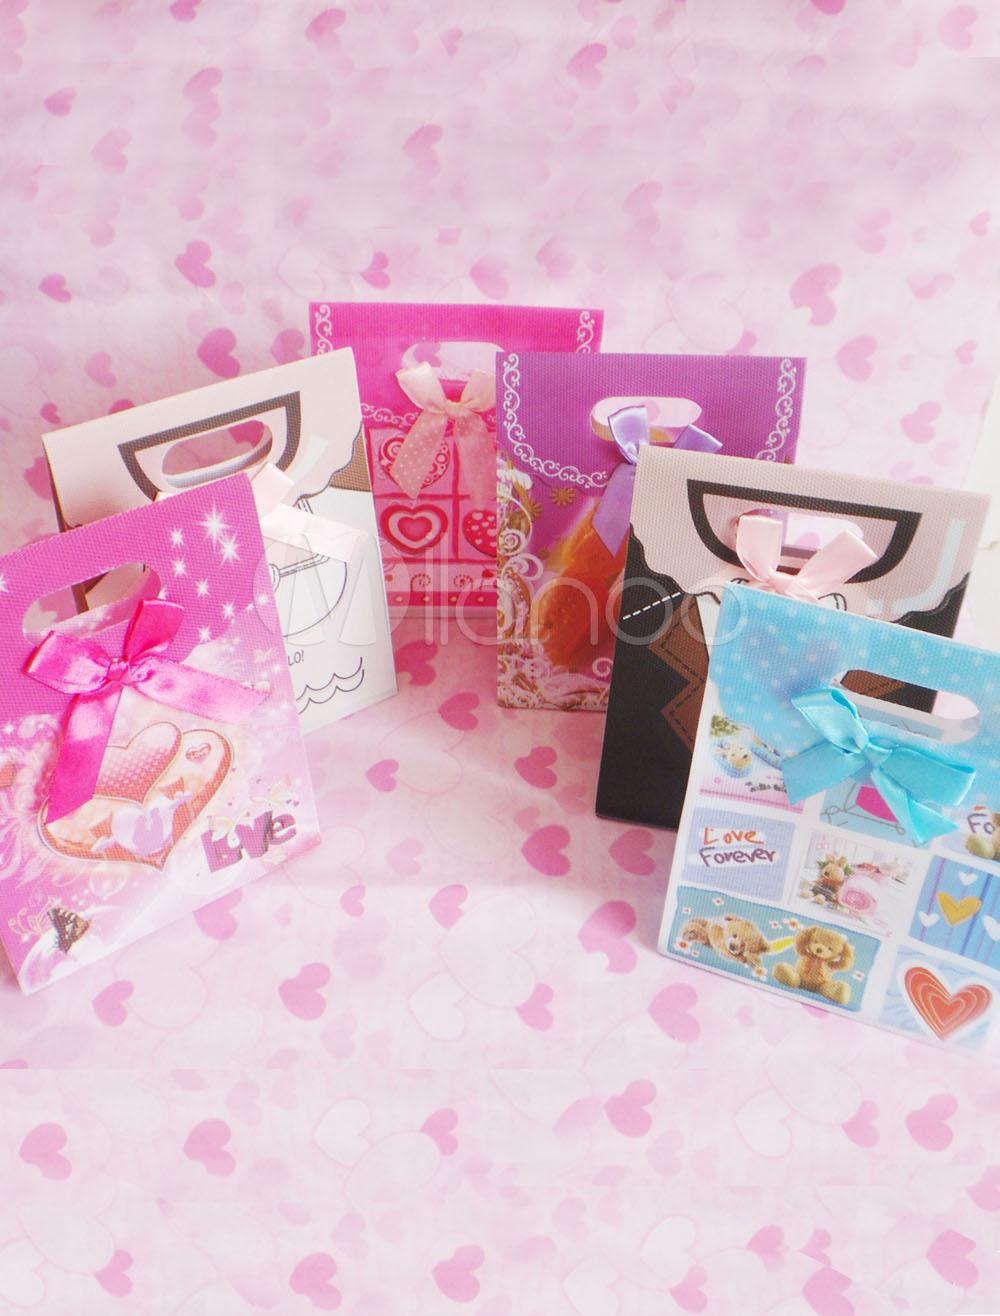 ... for wedding wedding 12 piece card paper present bag for wedding USD 4 99